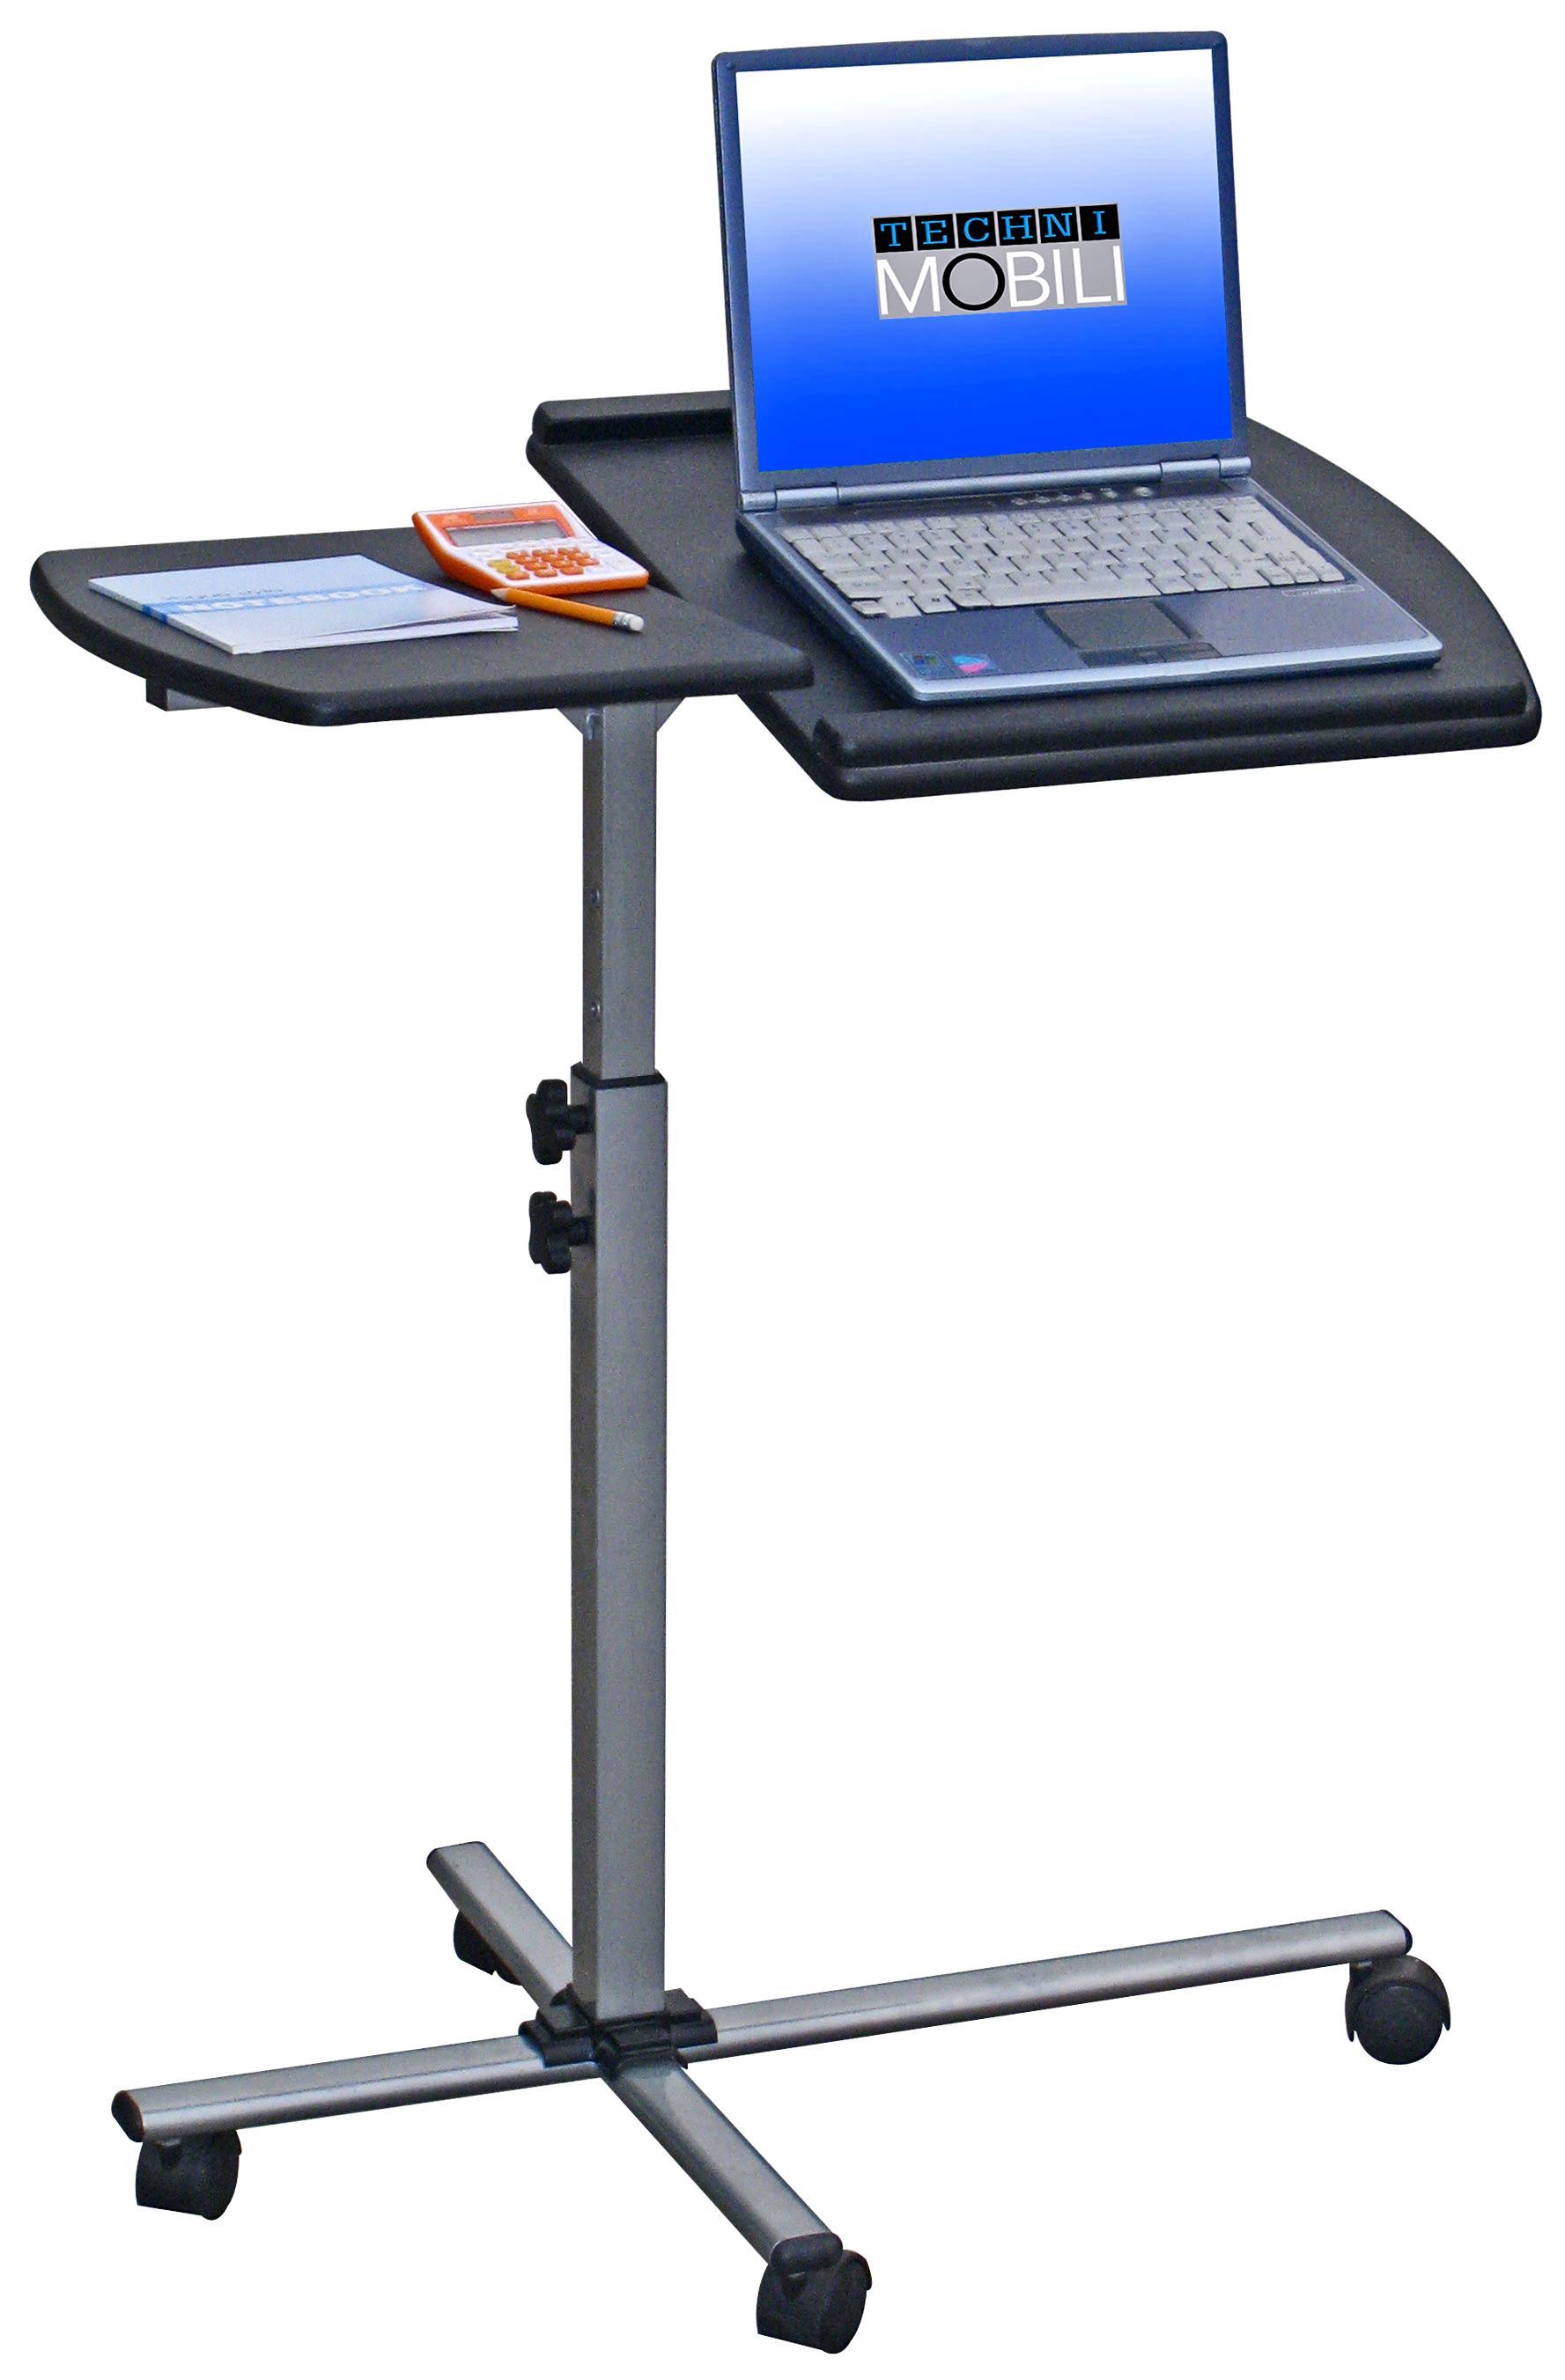 Techni Mobili Laptop Stand By OJ Commerce RTA B003 M615